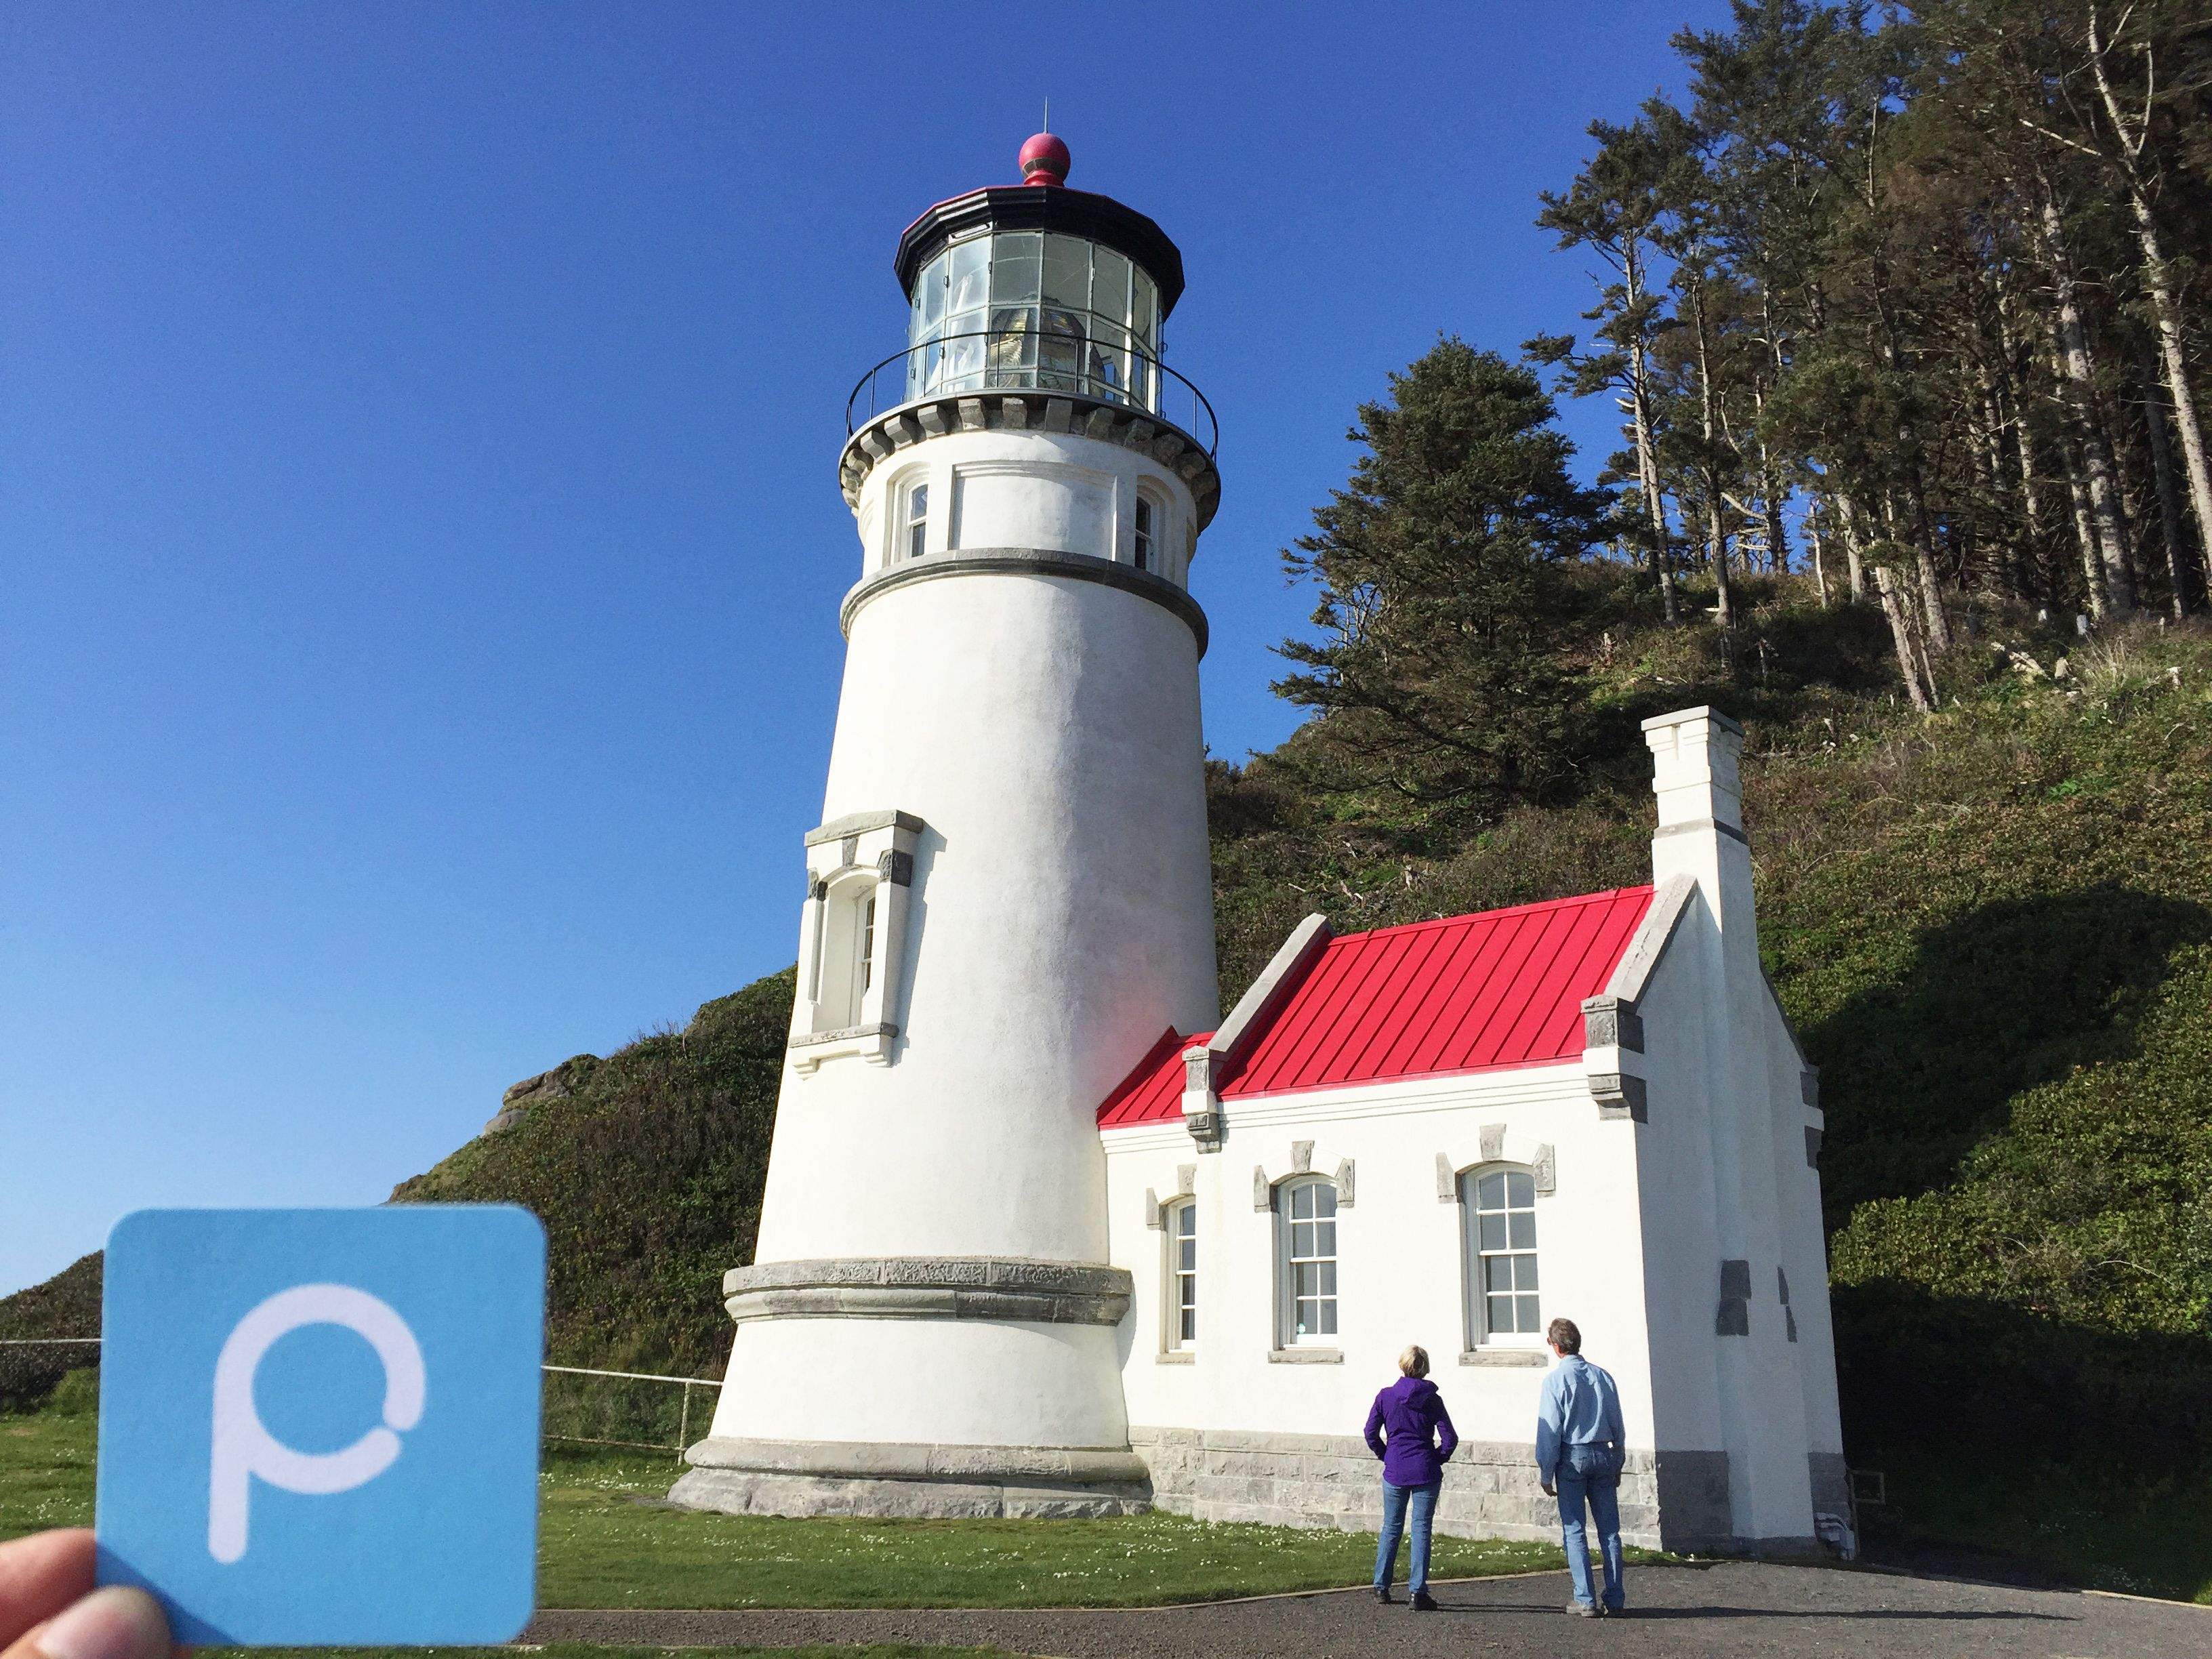 Heceta Head Light is a lighthouse on the Oregon Coast 13